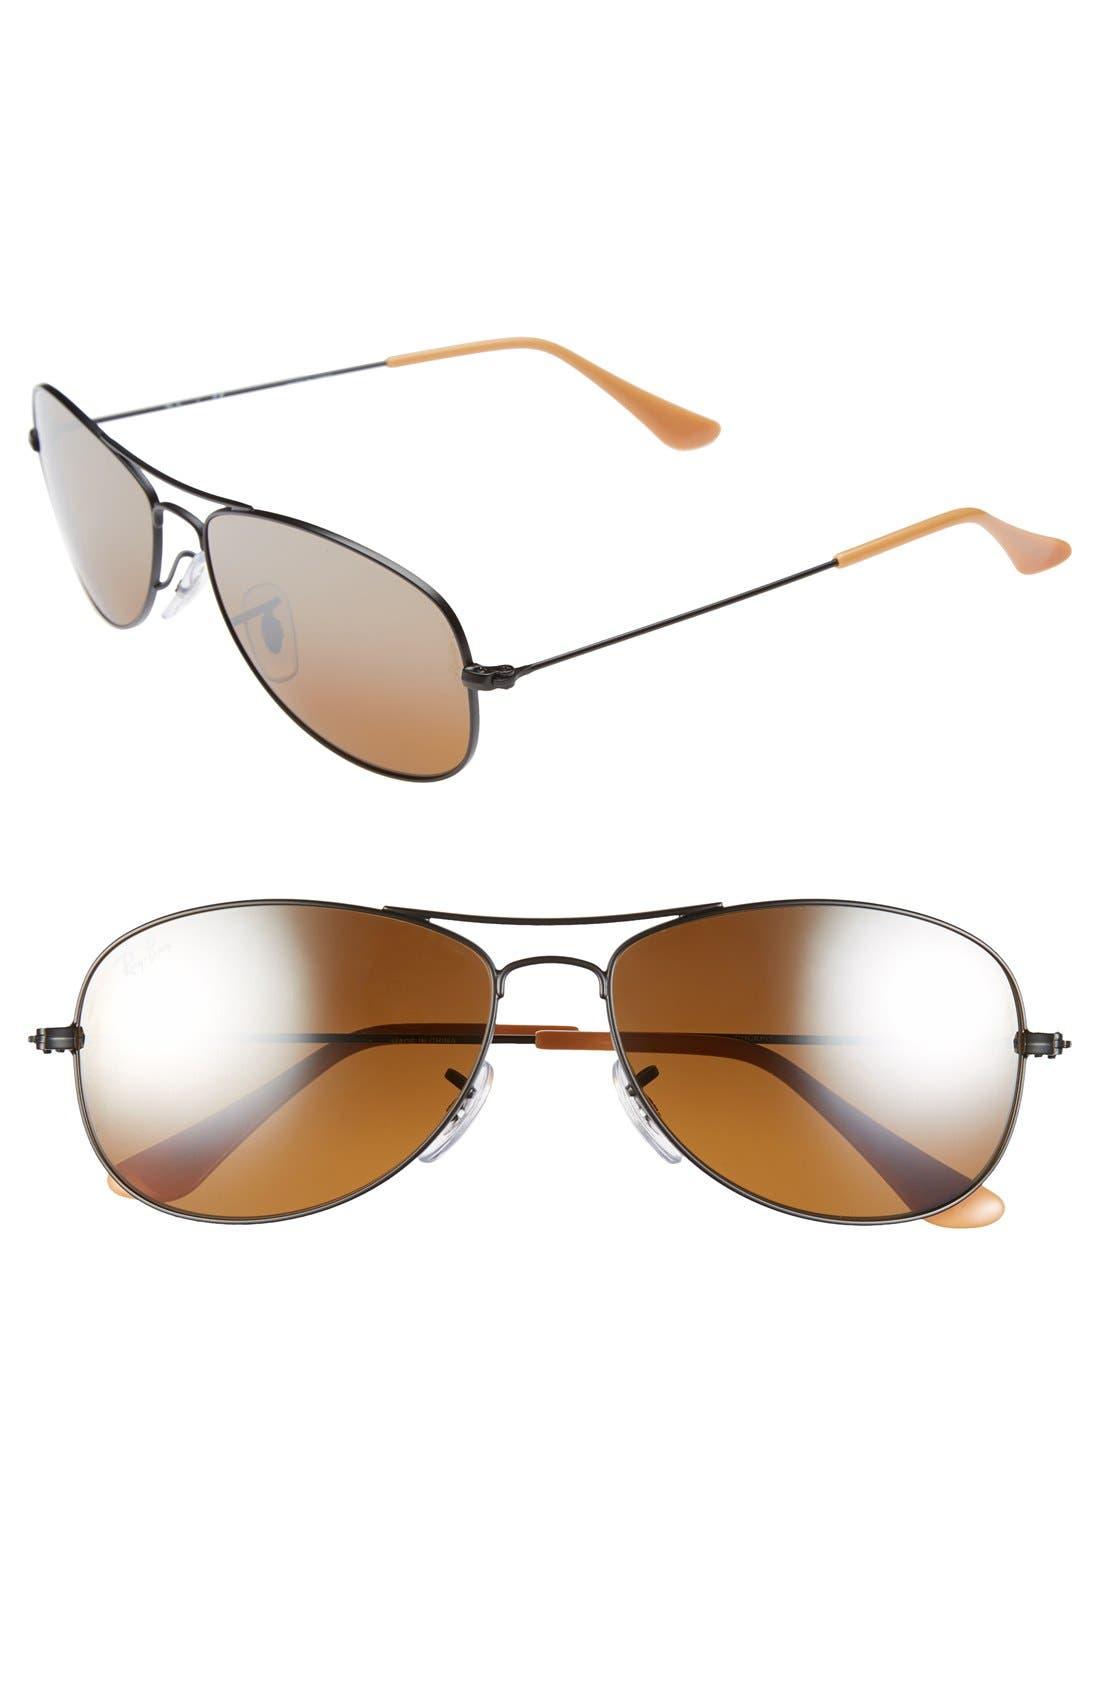 Main Image - Ray-Ban 'New Classic' 56mm Aviator Sunglasses